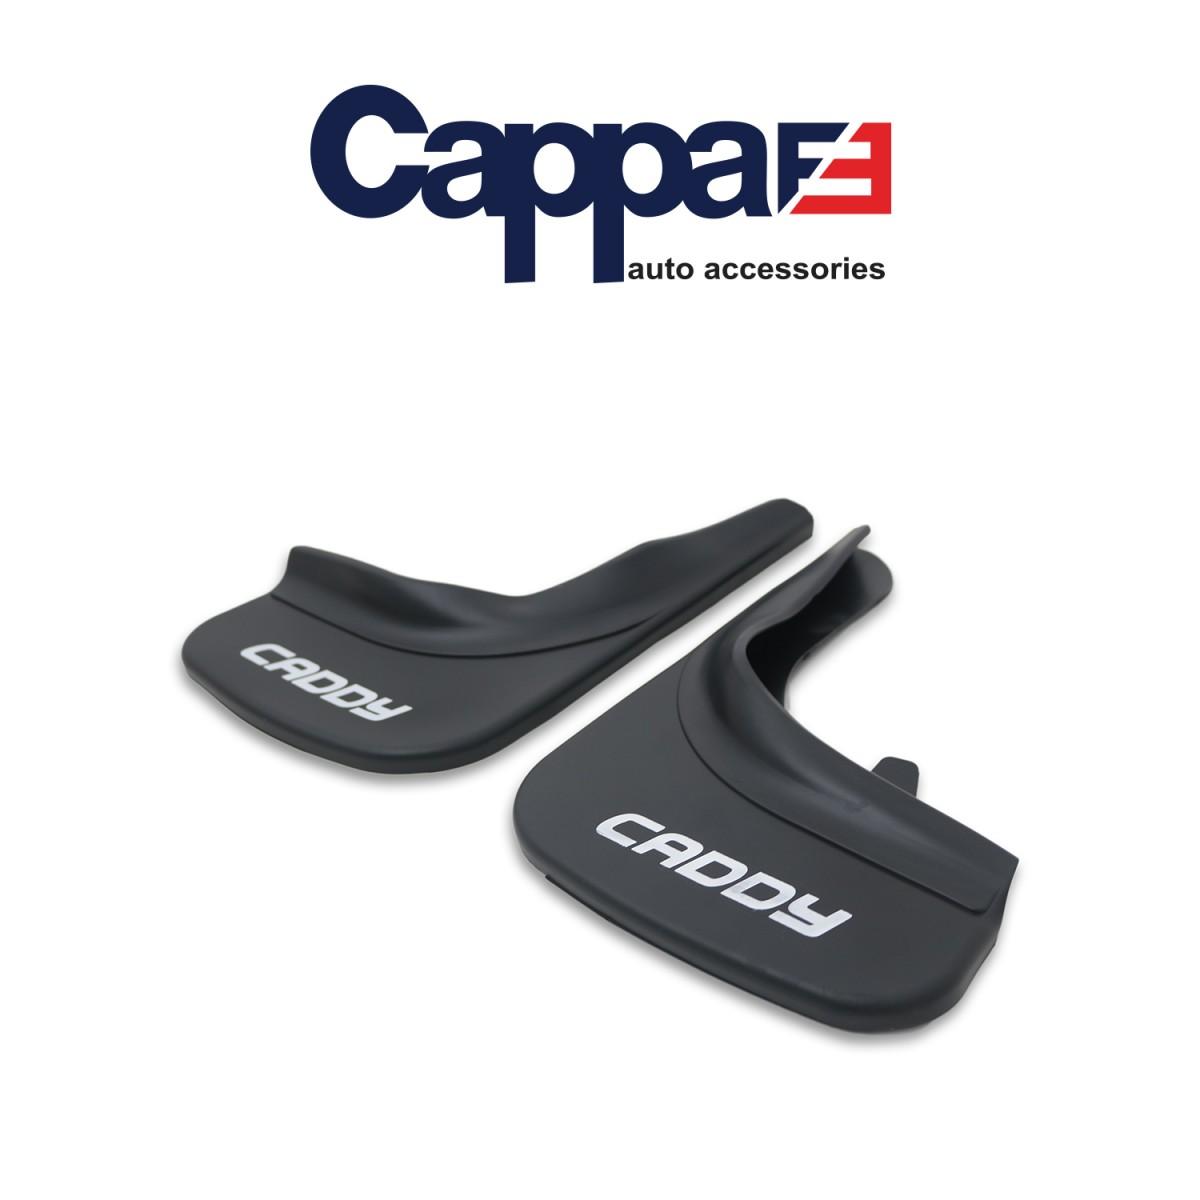 CAPPAFE Volkswagen Caddy Paçalık Tozluk Set 2 Prç Bütün Md.Uyumlu